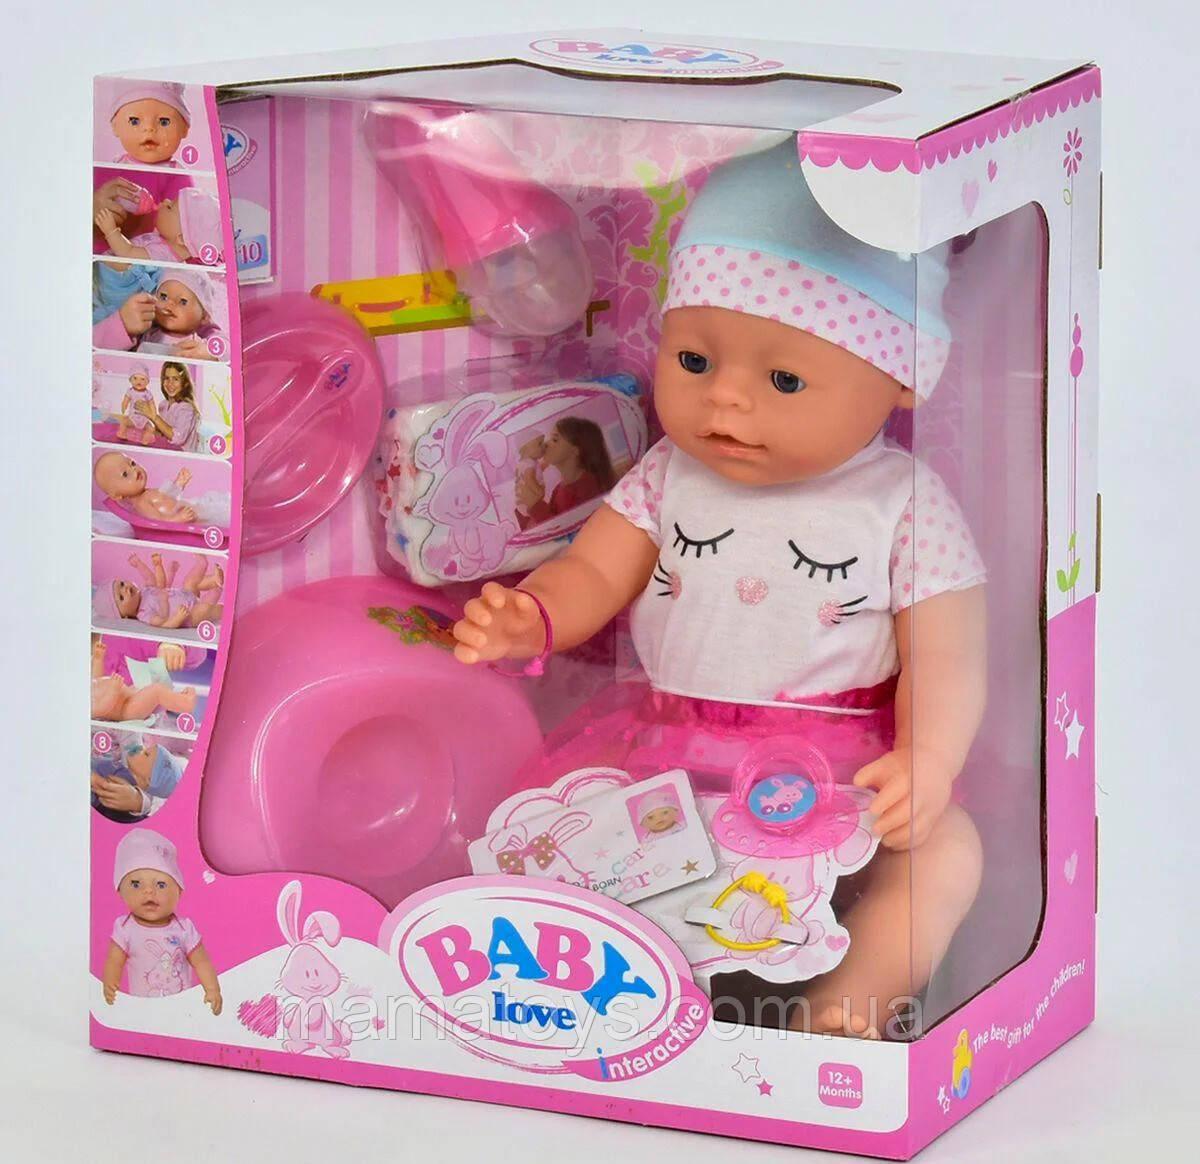 Кукла Baby Беби Пупс  BL 023 D 42 см, горшок, подгузник, соска, тарелка, каша